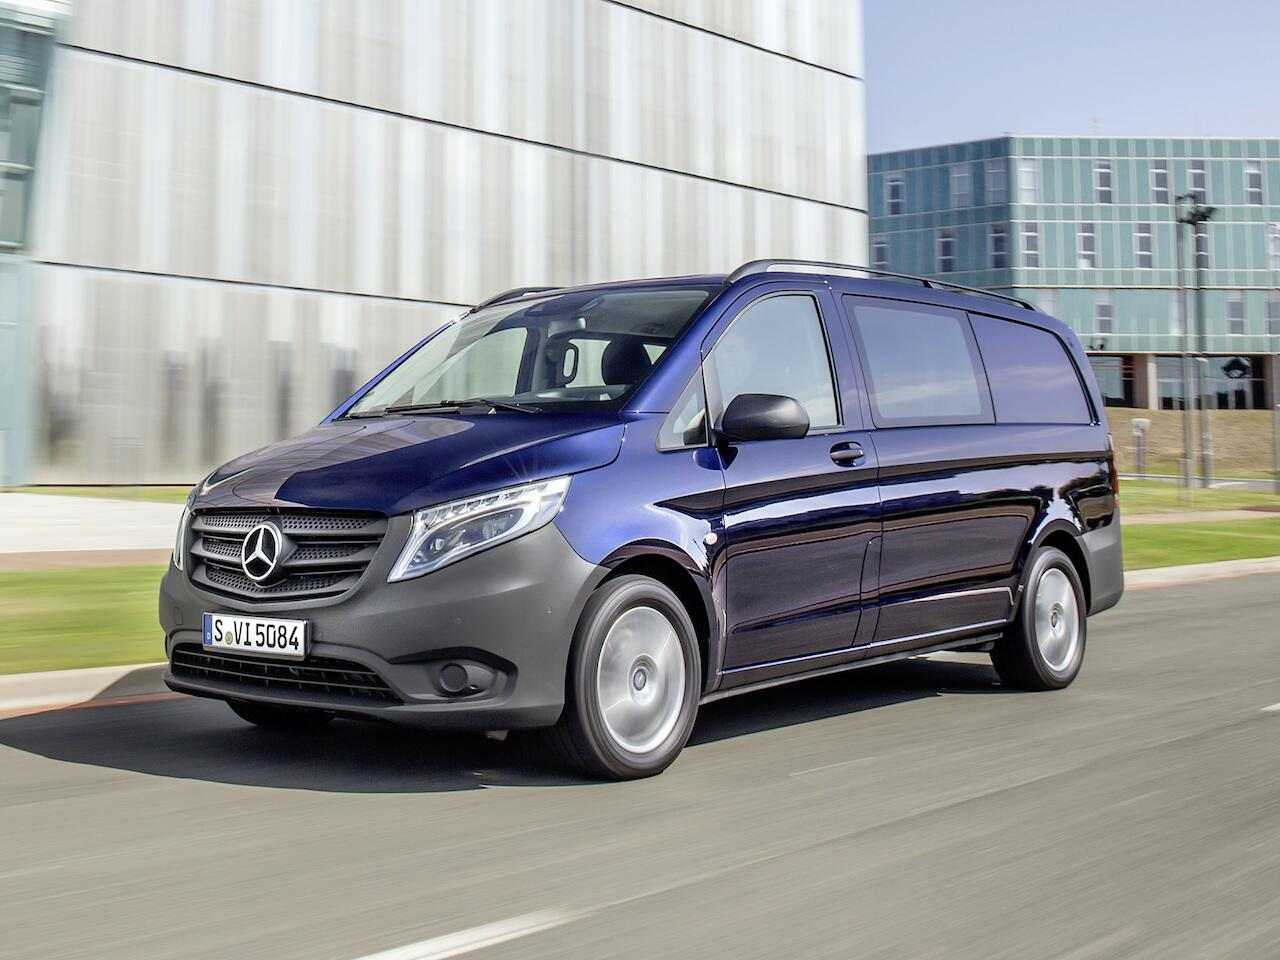 Bild zu Platz 9: Mercedes-Benz Vito